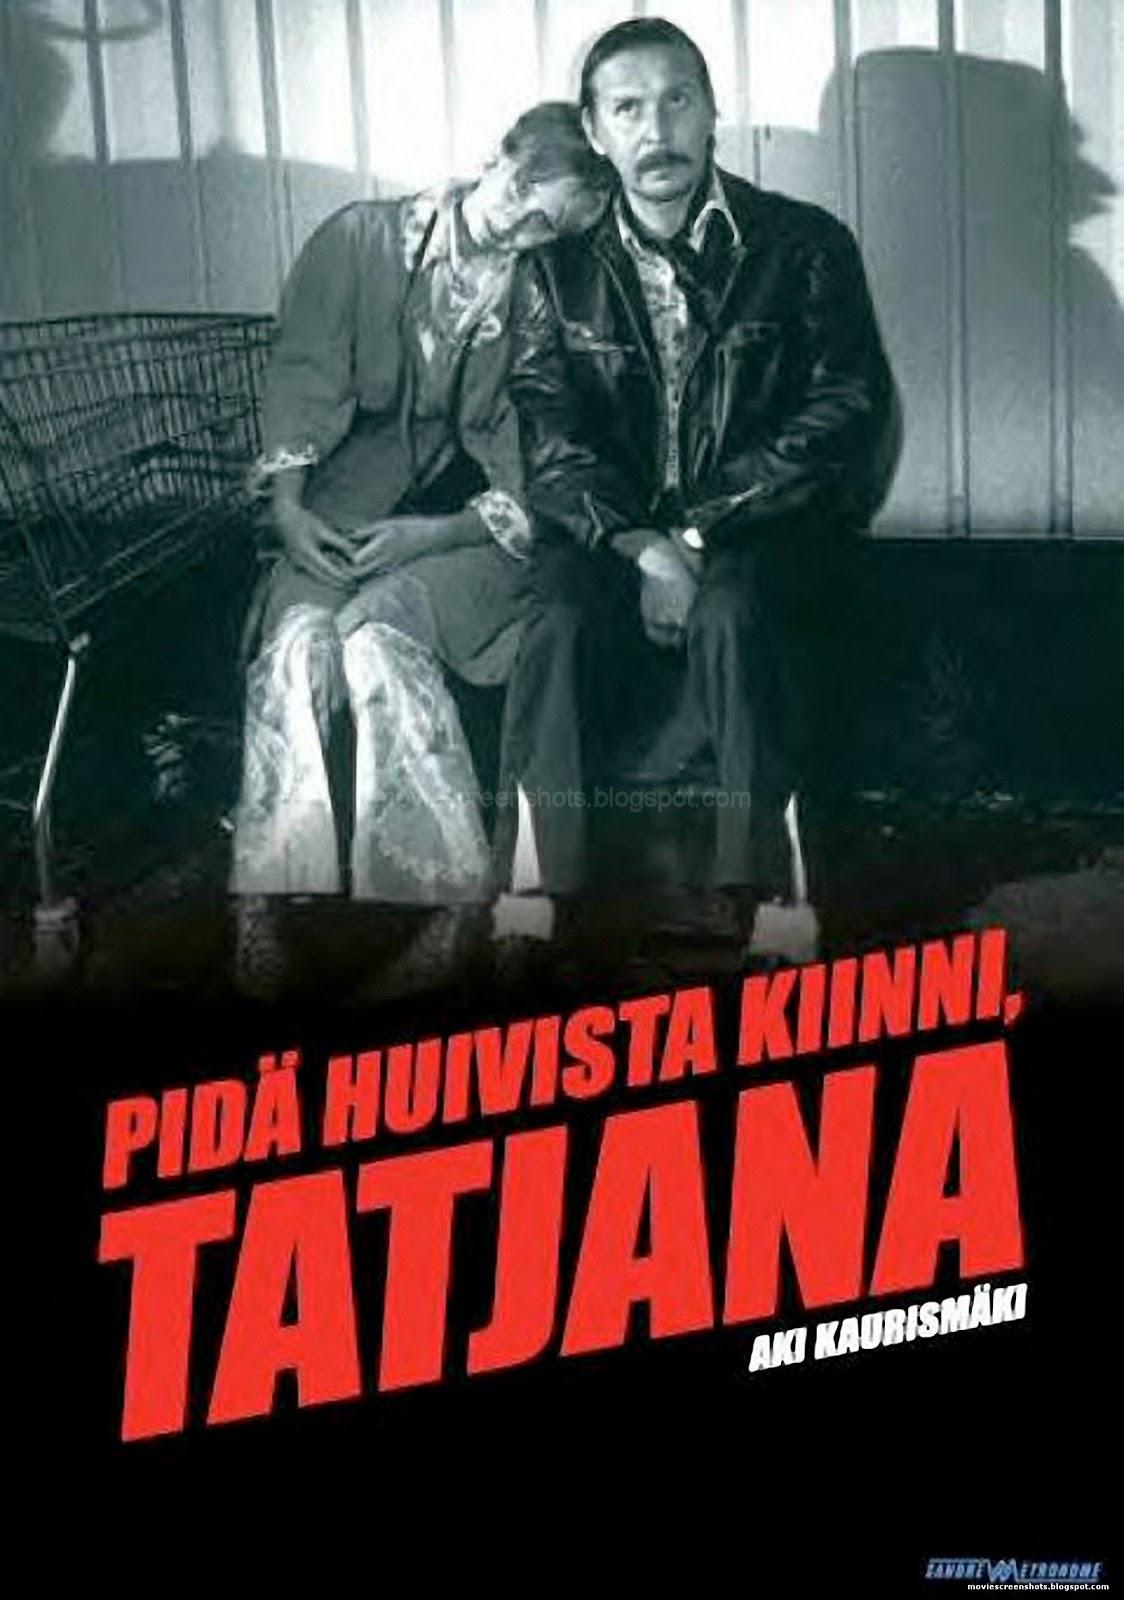 http://1.bp.blogspot.com/-89pSZICxxic/U9Hk7Iwag4I/AAAAAAAO8a8/tqlTW8X7gCU/s1600/Take_Care_Of_Your_Scarf_Tatiana-1994-MSS-poster-2.jpg